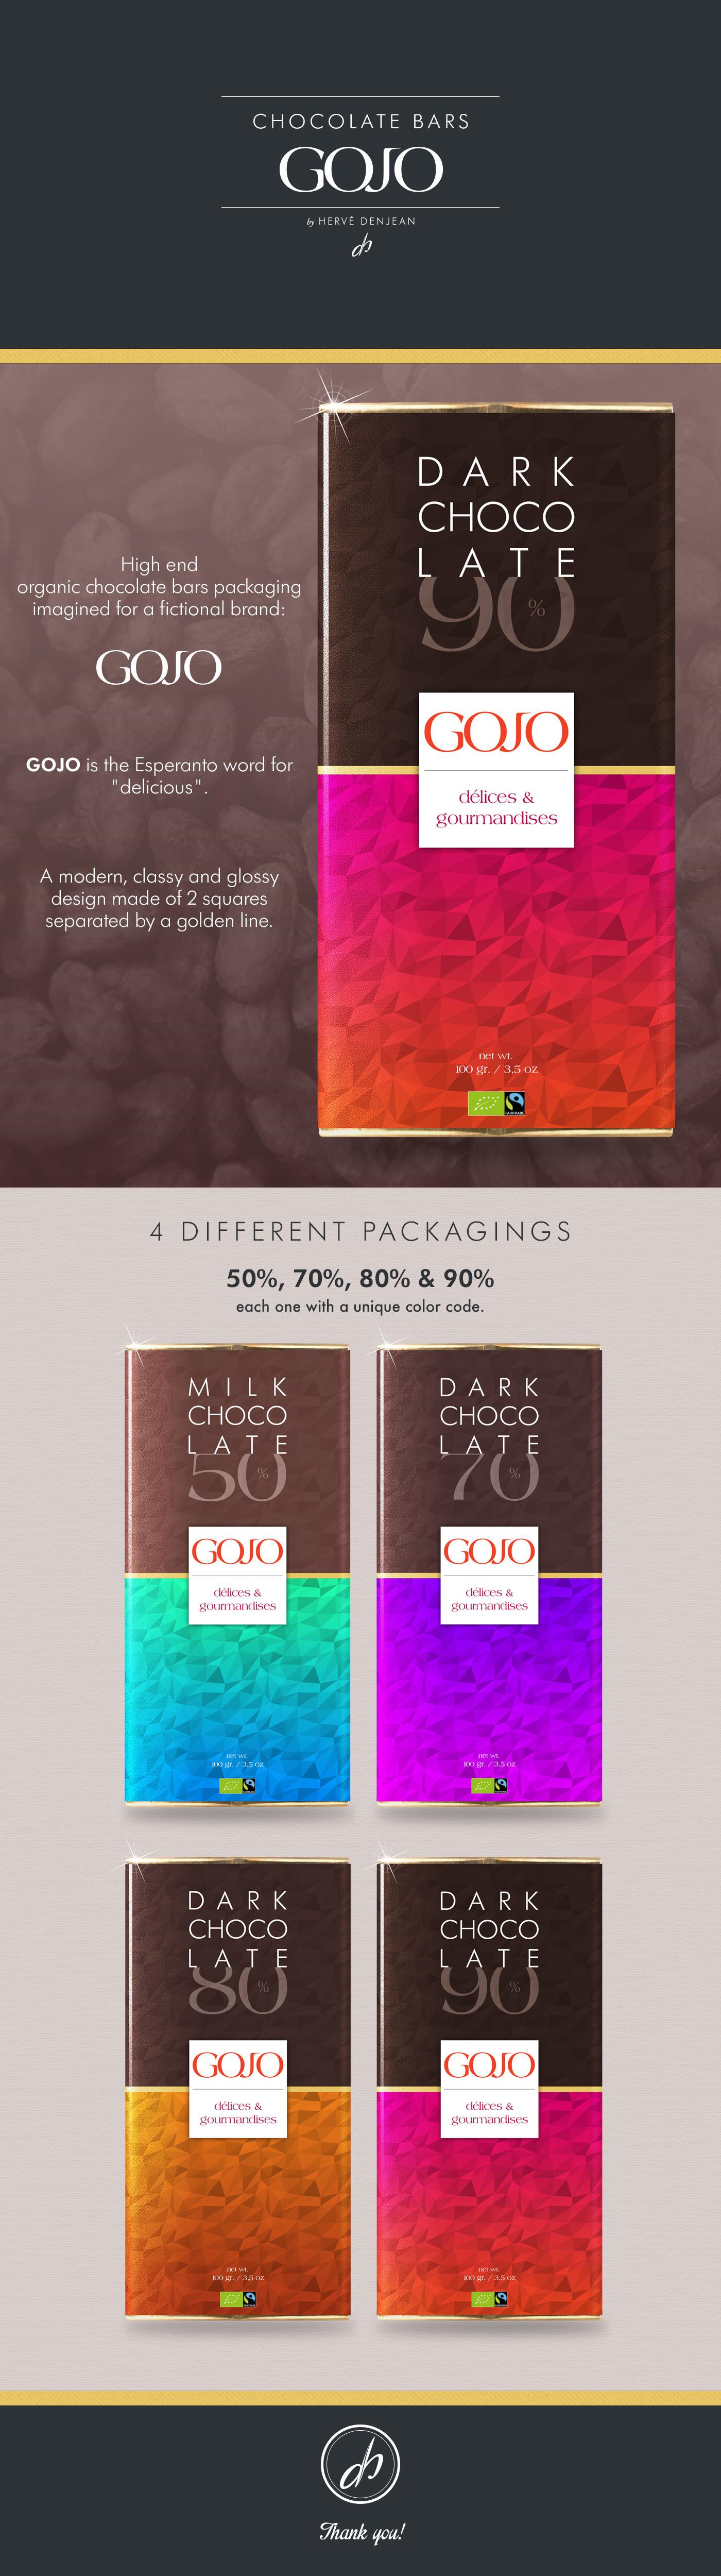 print chocolate bar color Cocoa